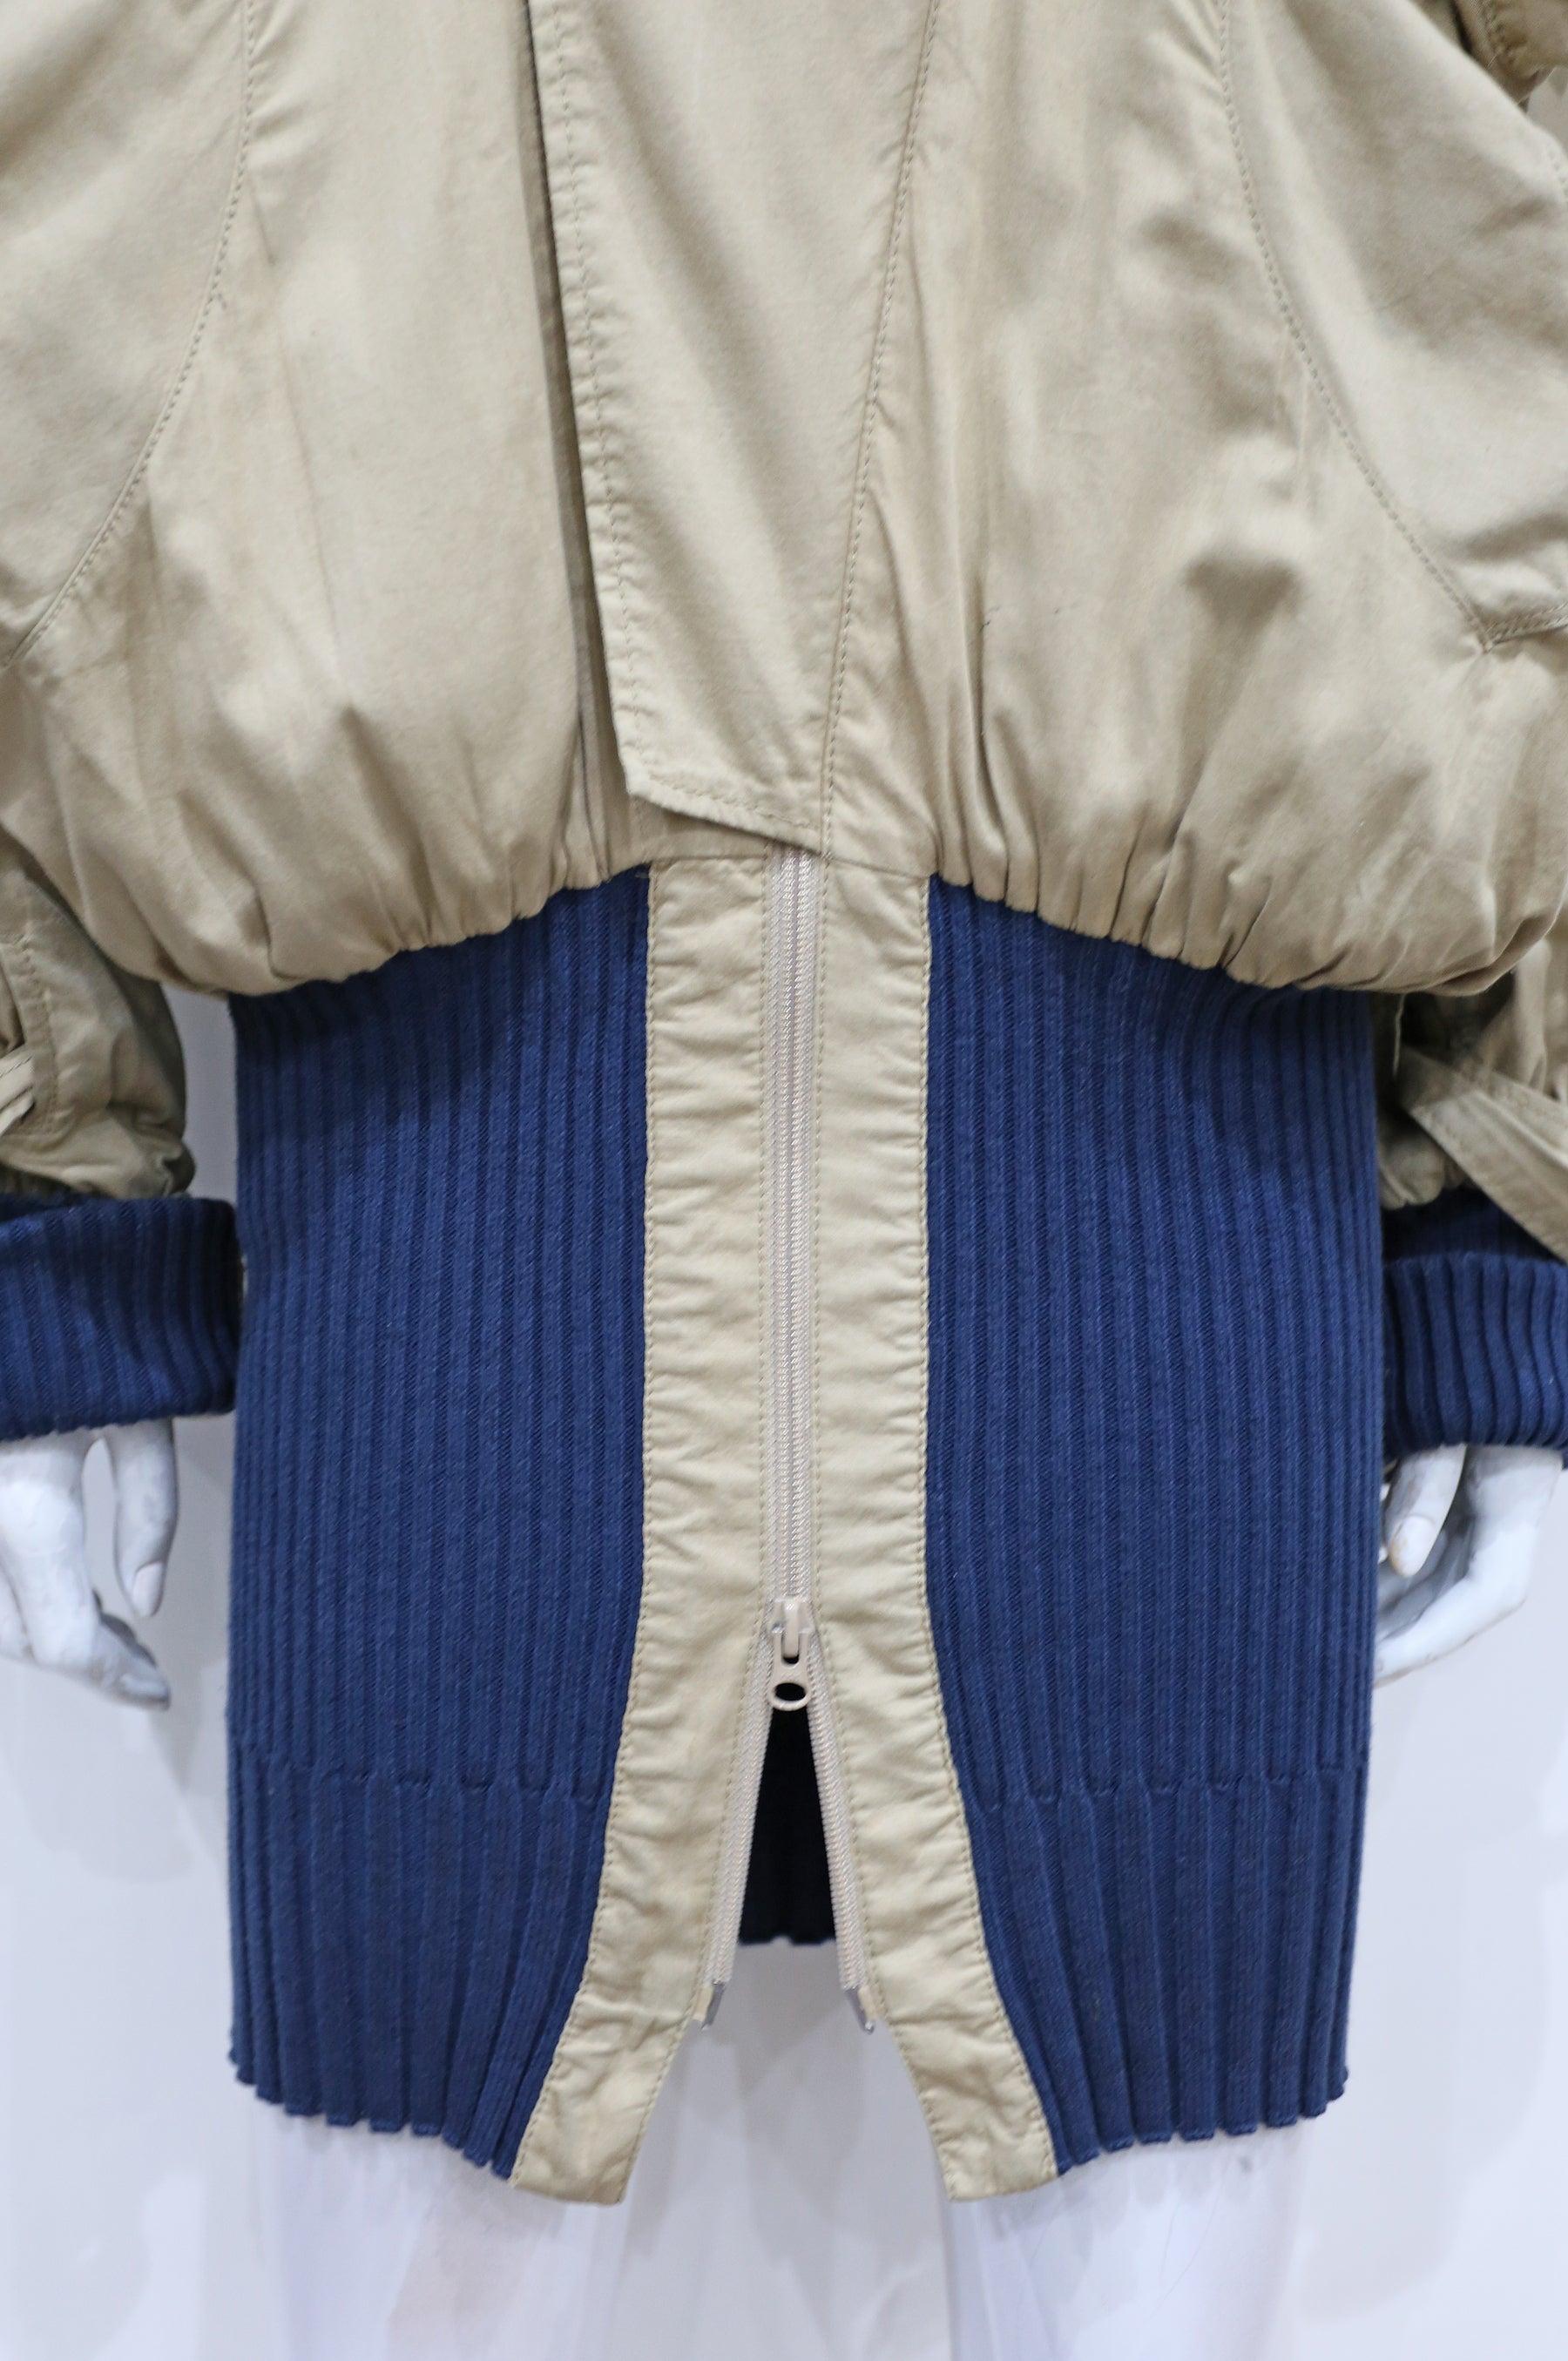 f4a61621b Vivienne Westwood unisex oversized 'Clint Eastwood' bomber jacket, c. 1990s